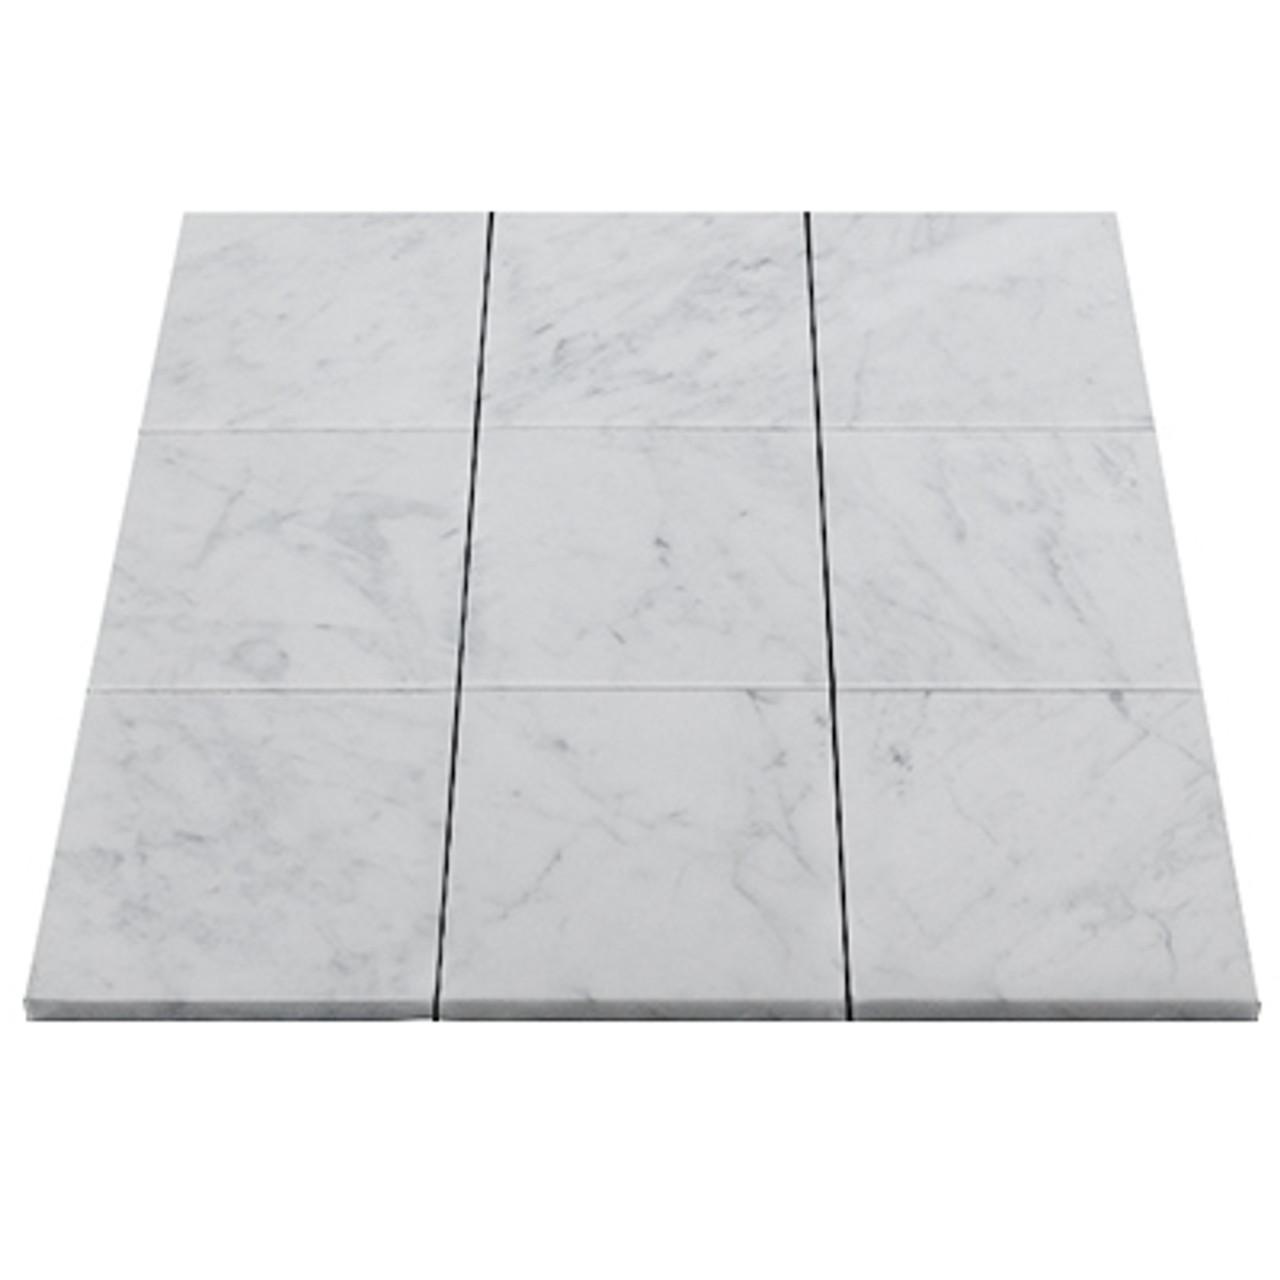 carrara marble italian white bianco carrera 4x4 marble tile honed